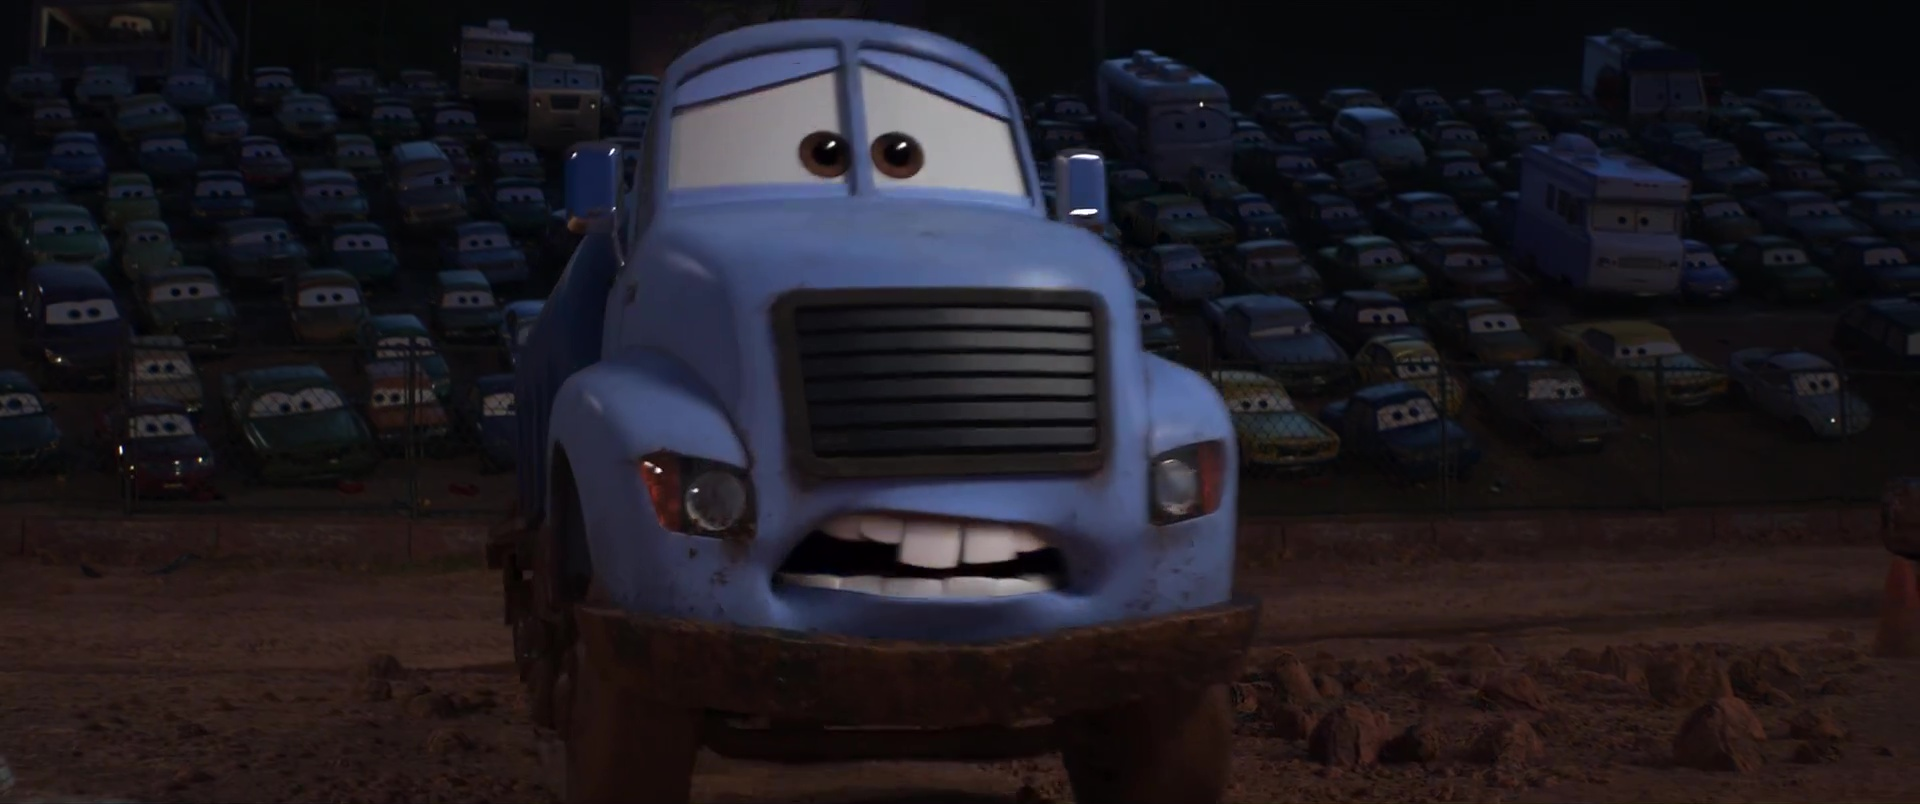 monsieur drippy mr personnage character disney pixar cars 3